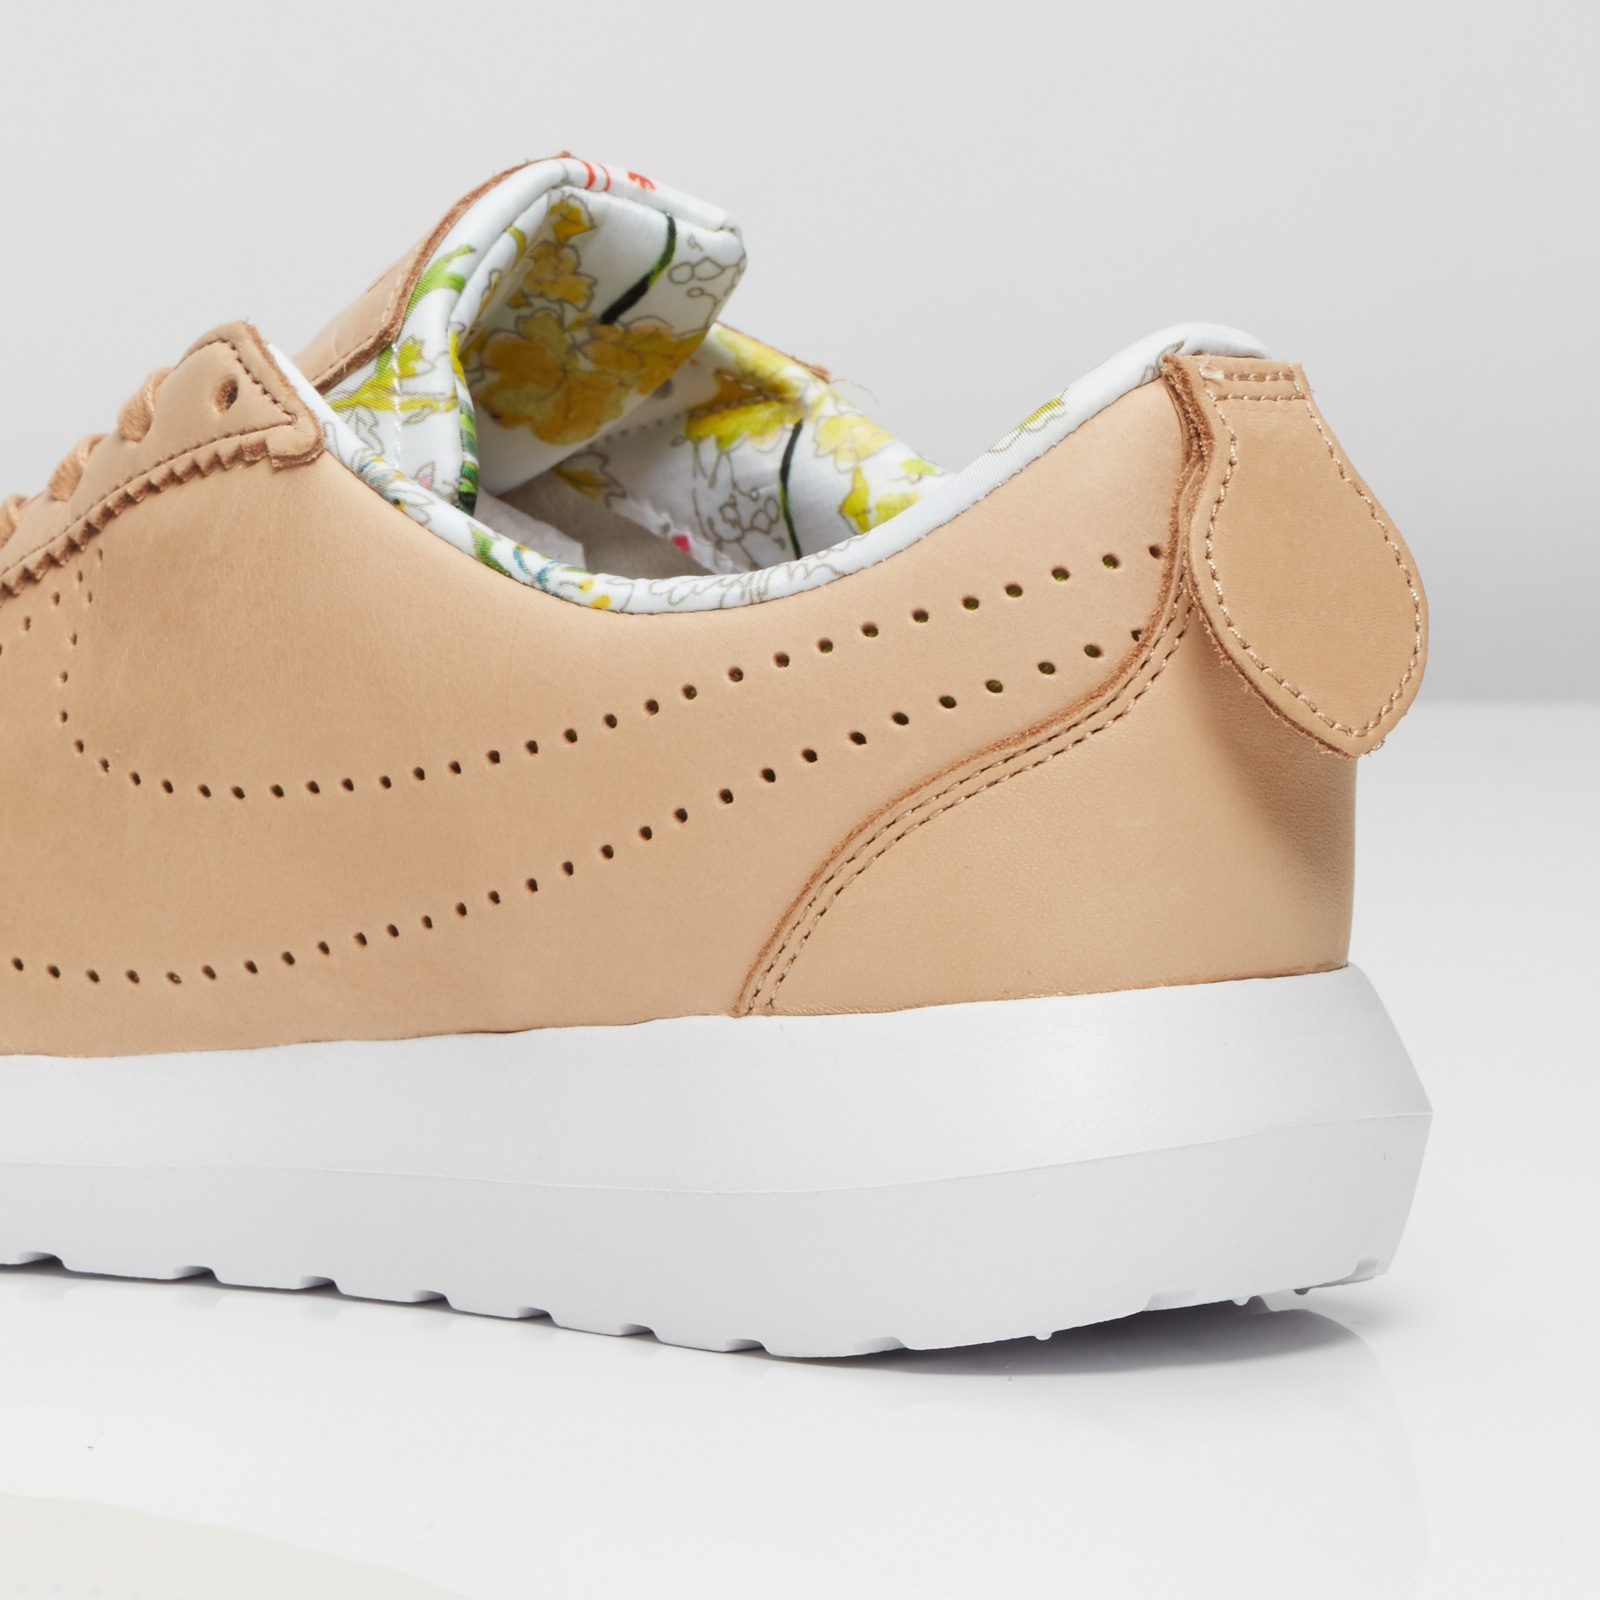 a1bb1347f5e4 Nike W Roshe Cortez NM LIB QS - 843847-200 - Sneakersnstuff ...